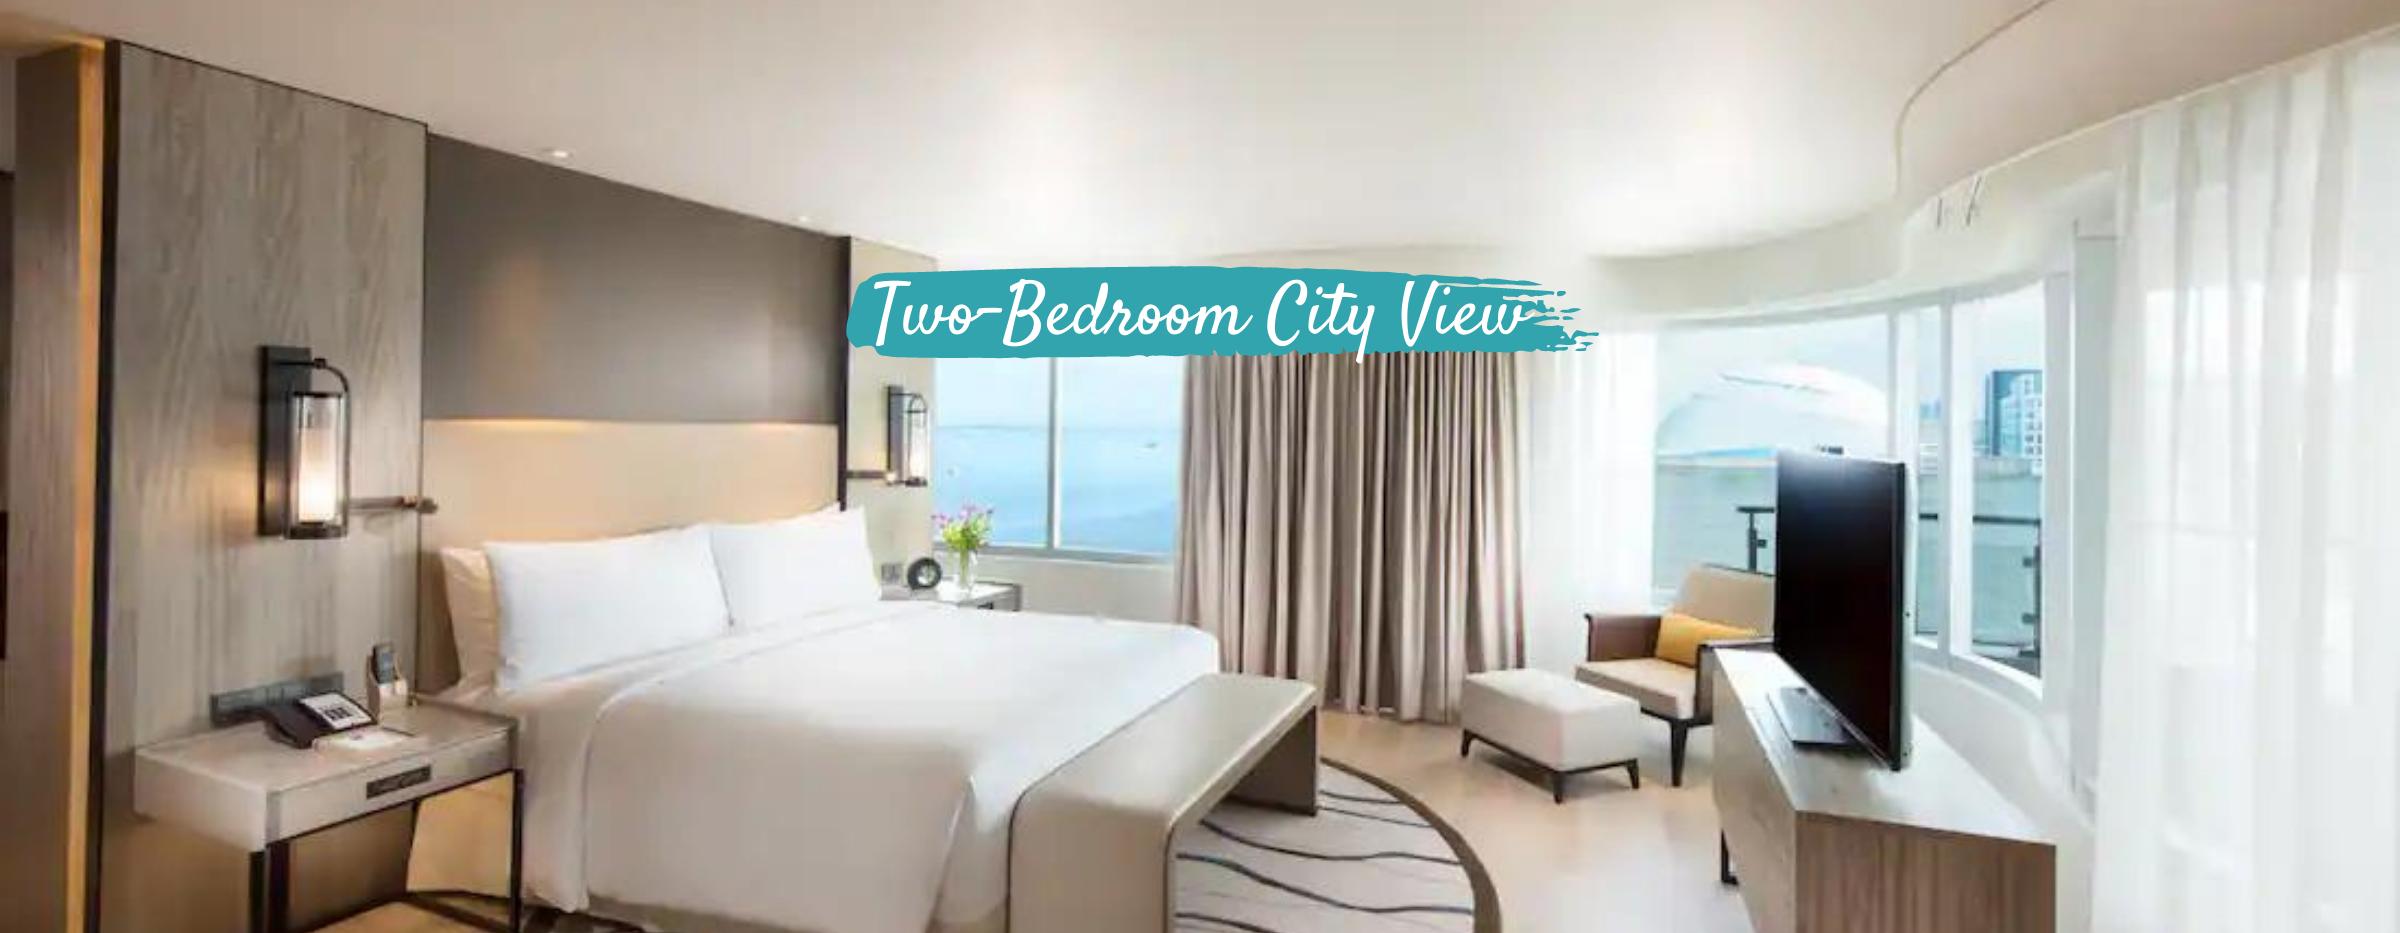 Conrad Hotel Two-Bedroom City View   SFO to MNL Philippine Airline Flight + Hotel Quarantine